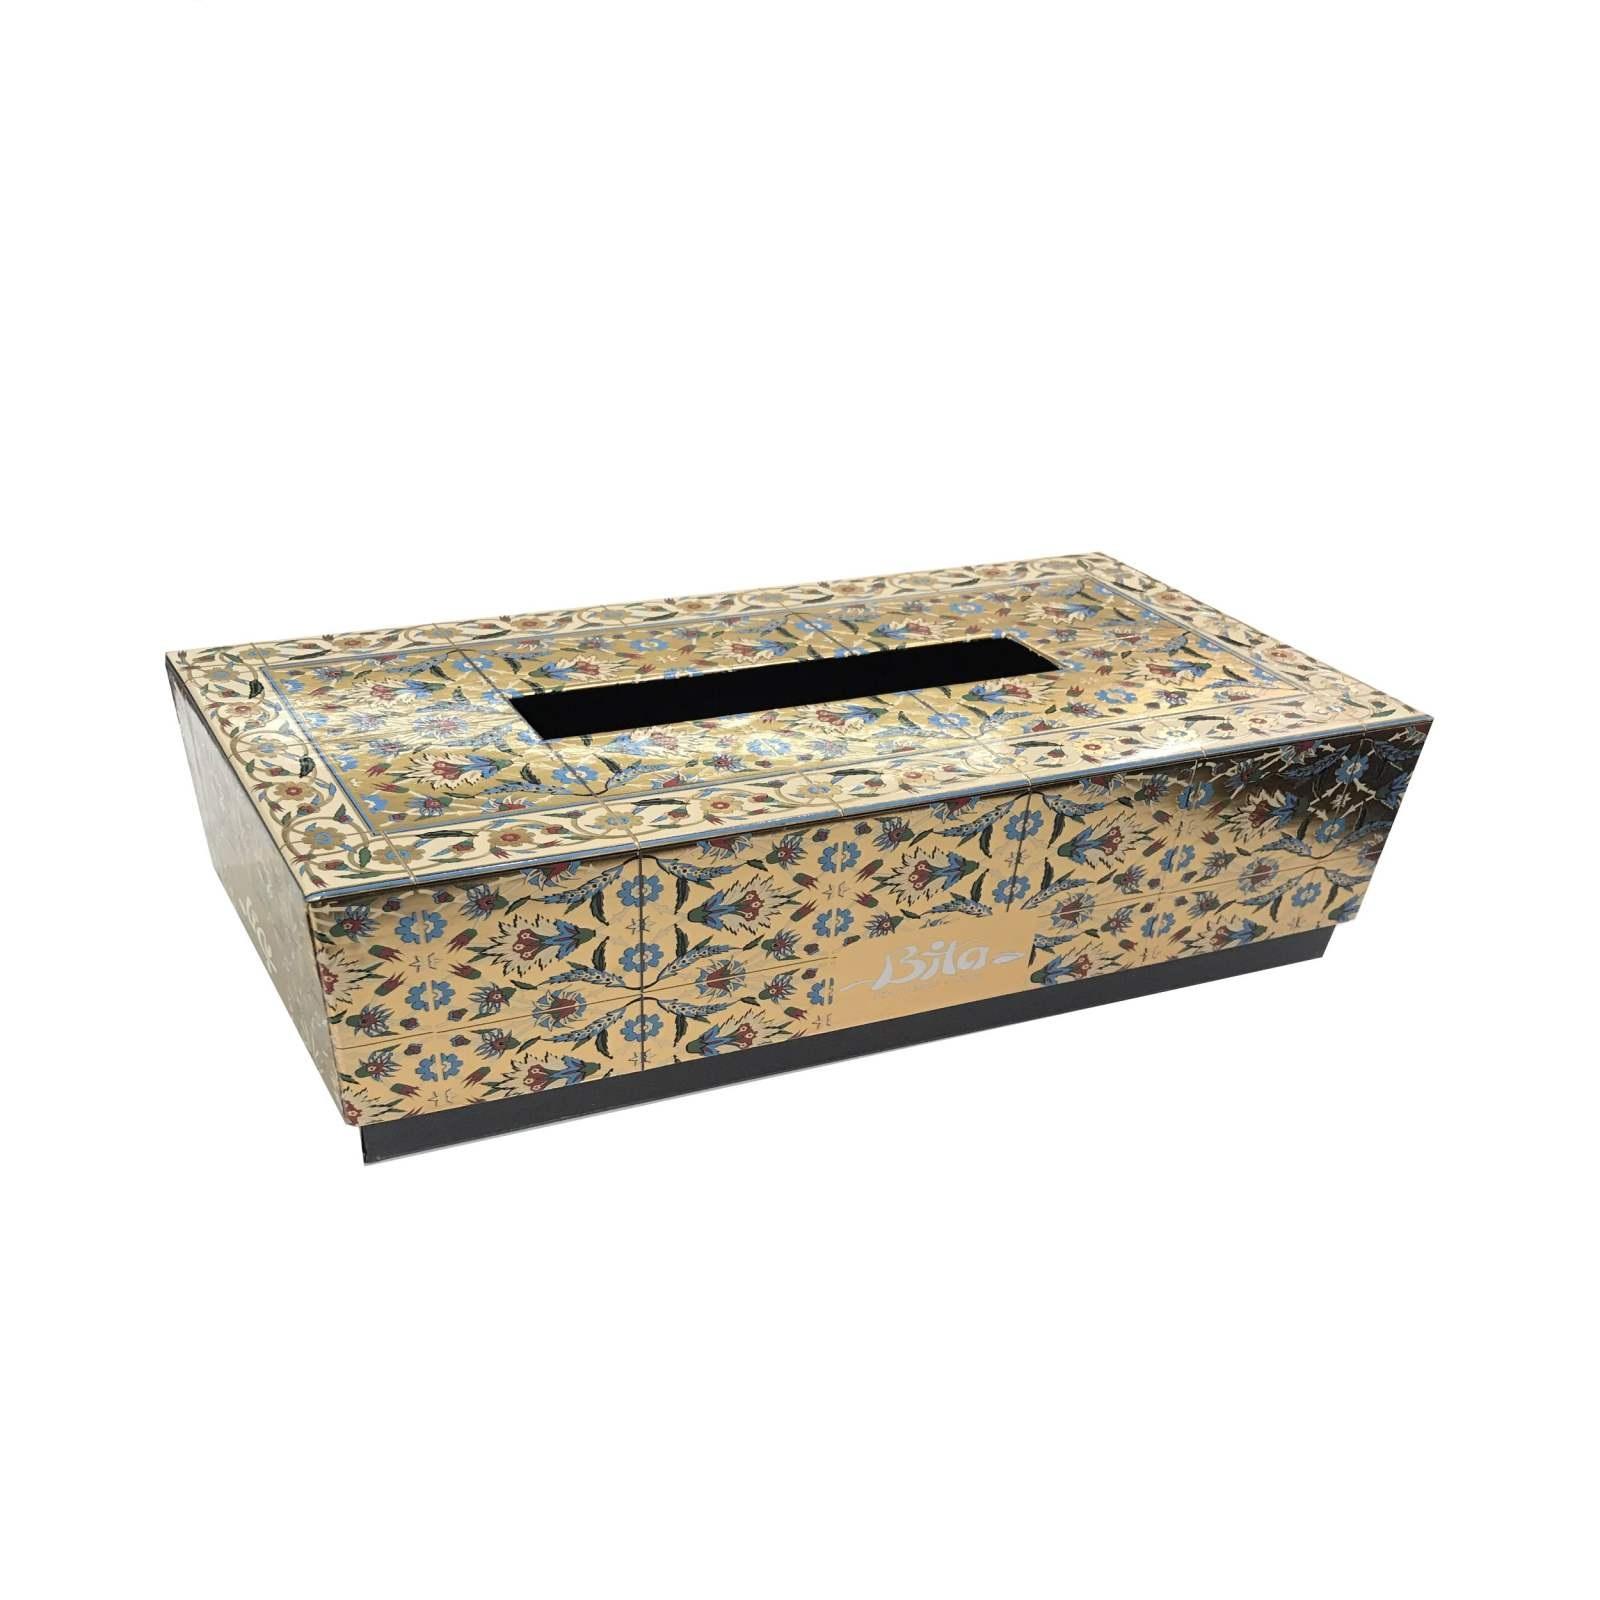 جعبه دستمال کاغذی بیتا مدل H-121